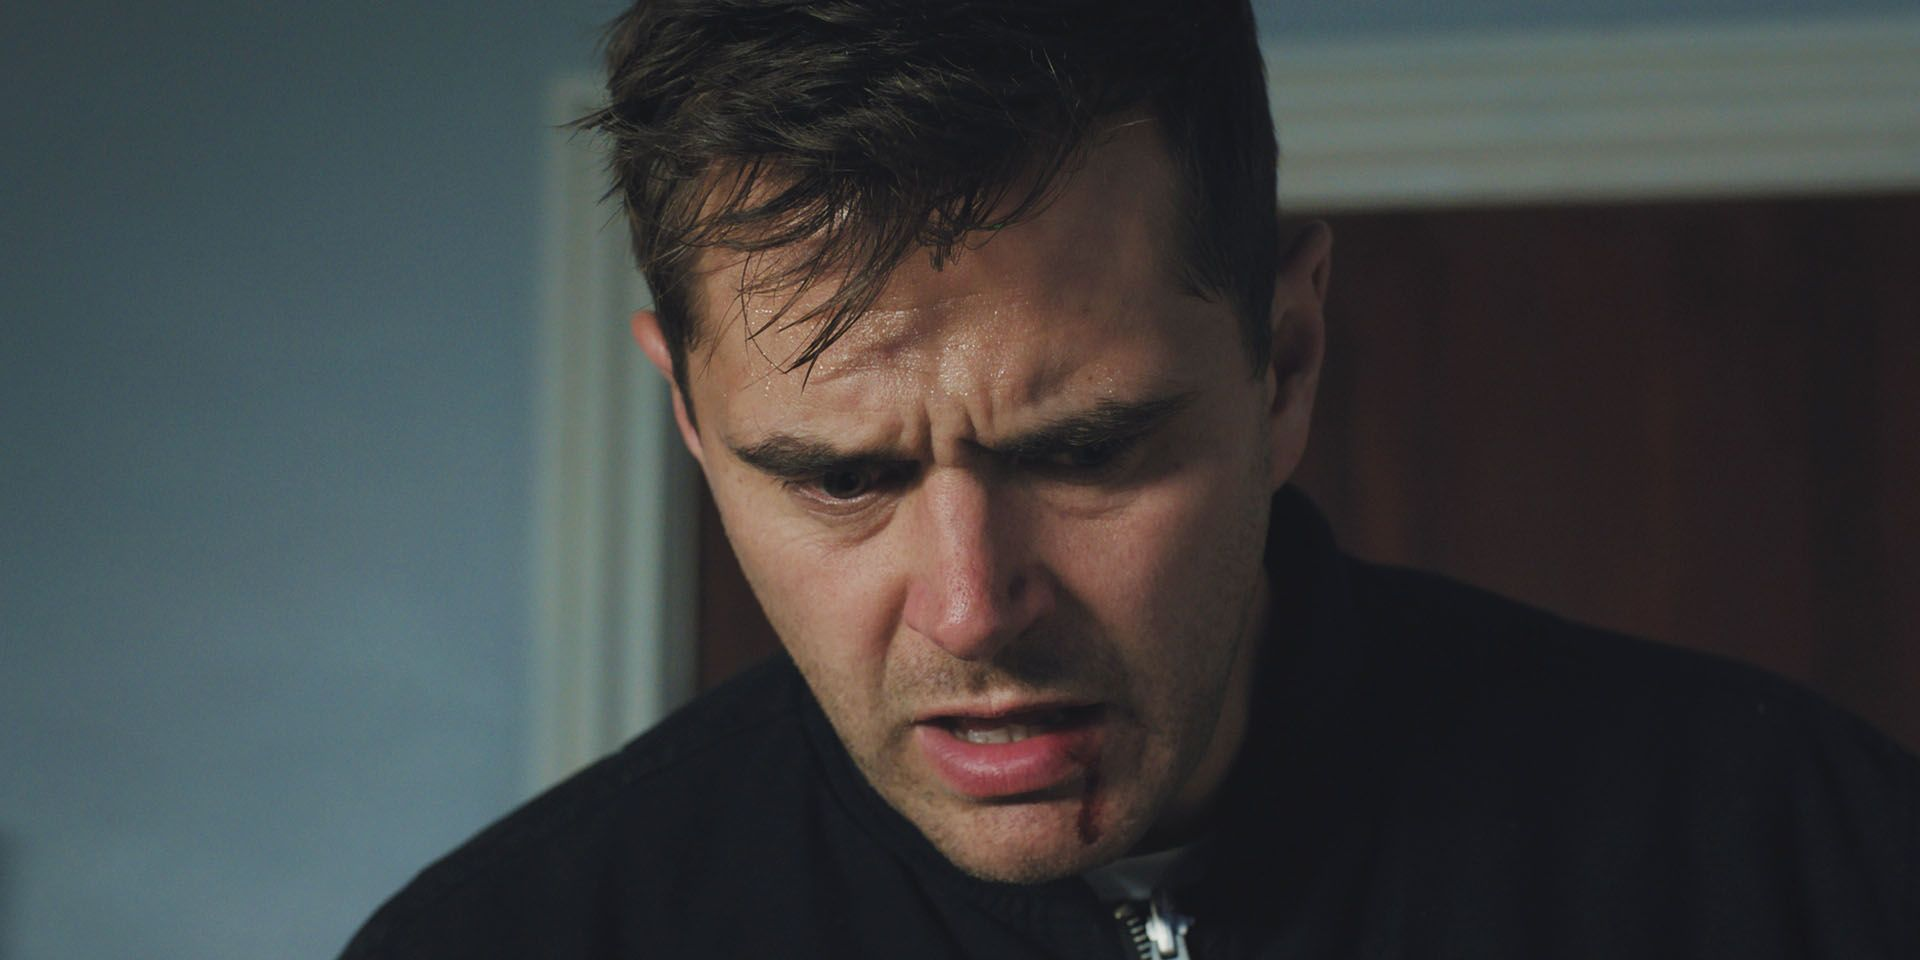 Iain Dean in Casualty